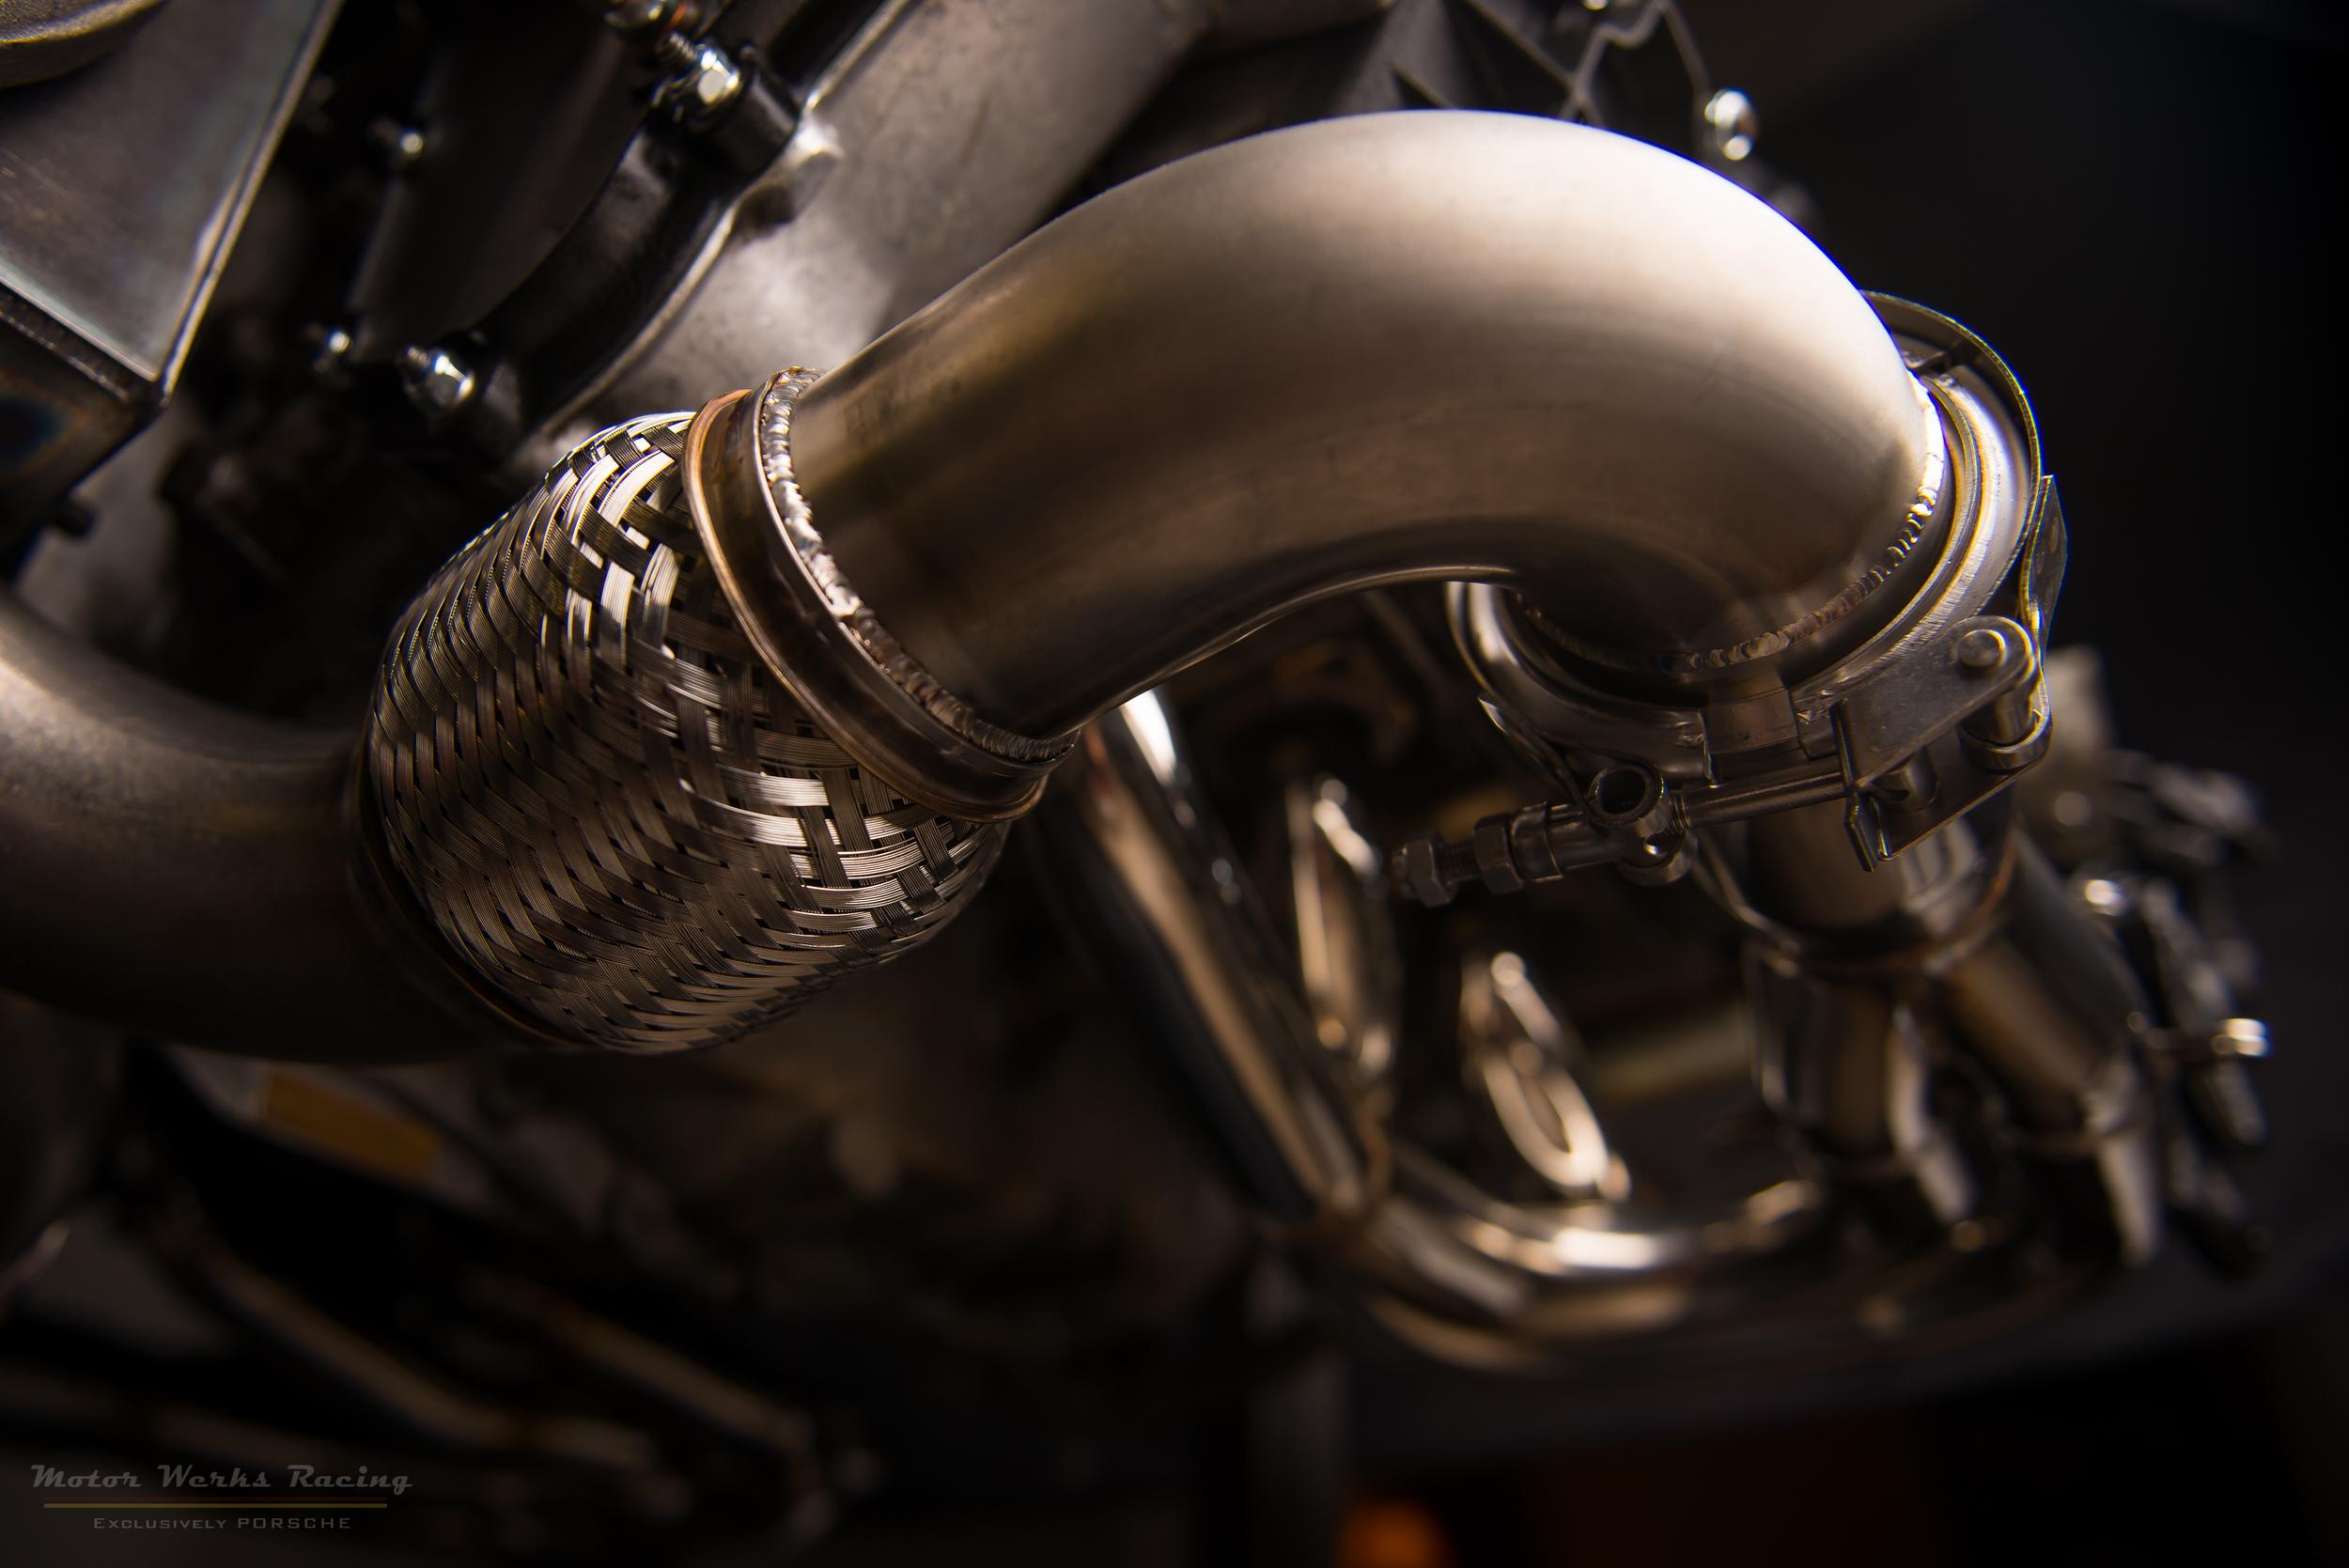 Porsche Custom Header & Exhaust